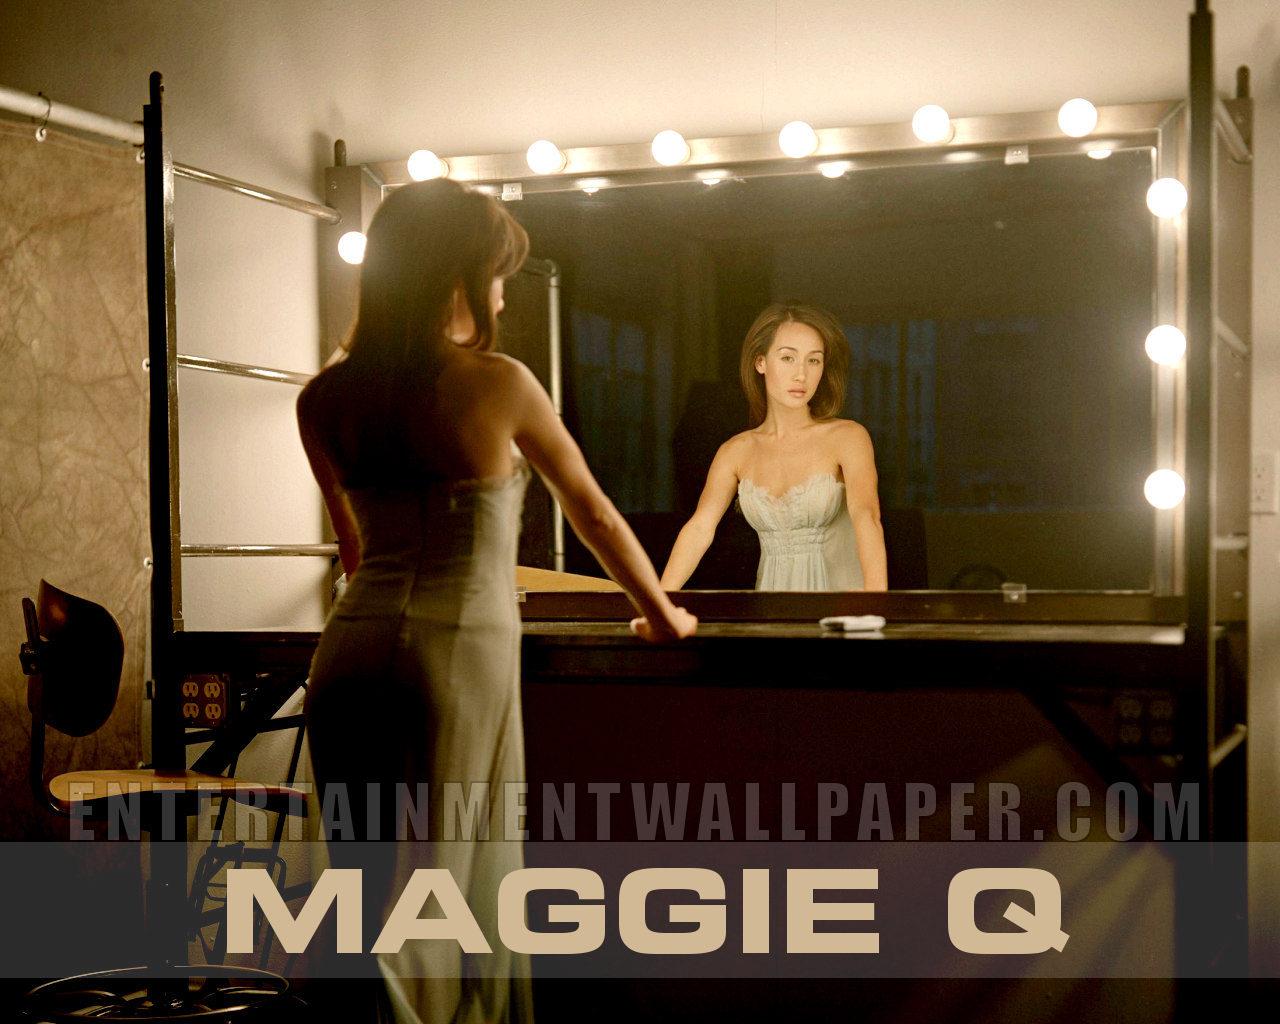 Maggie Q Wallpaper